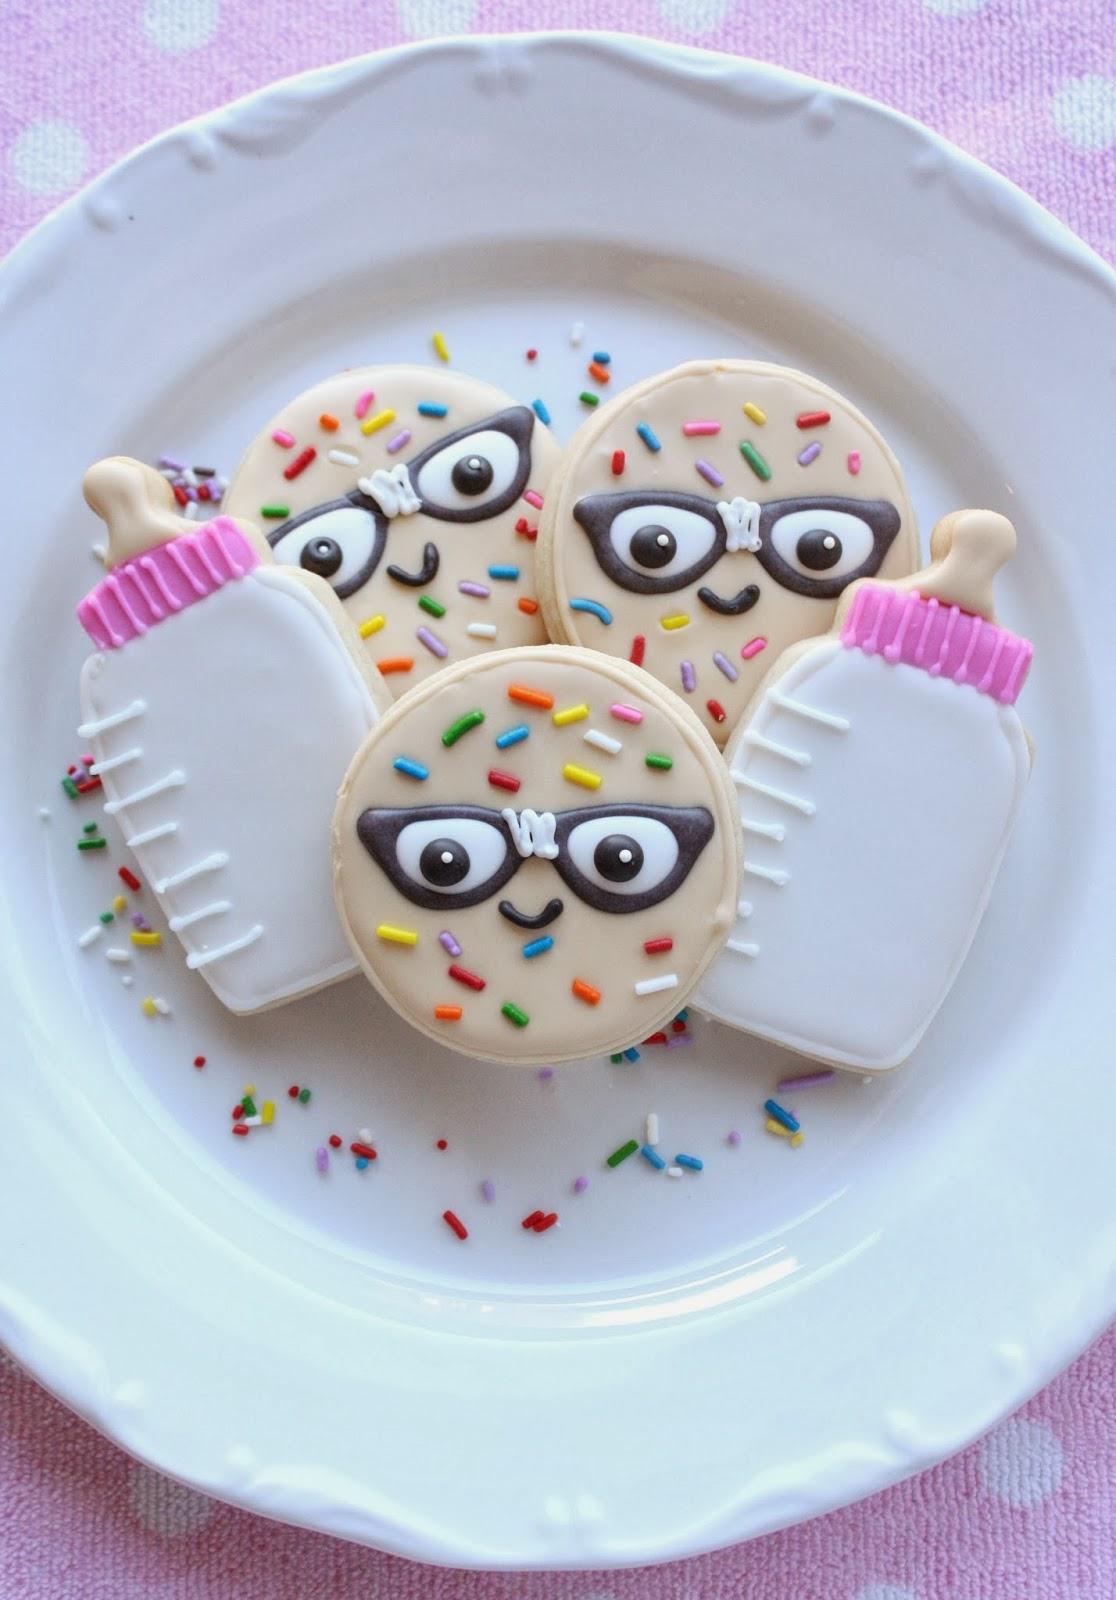 Geeky Sugar Cookies For Jenniferu0027s (NoYoMoCo) Geek Themed Baby Shower. A  Geeky Baby Shower You ...